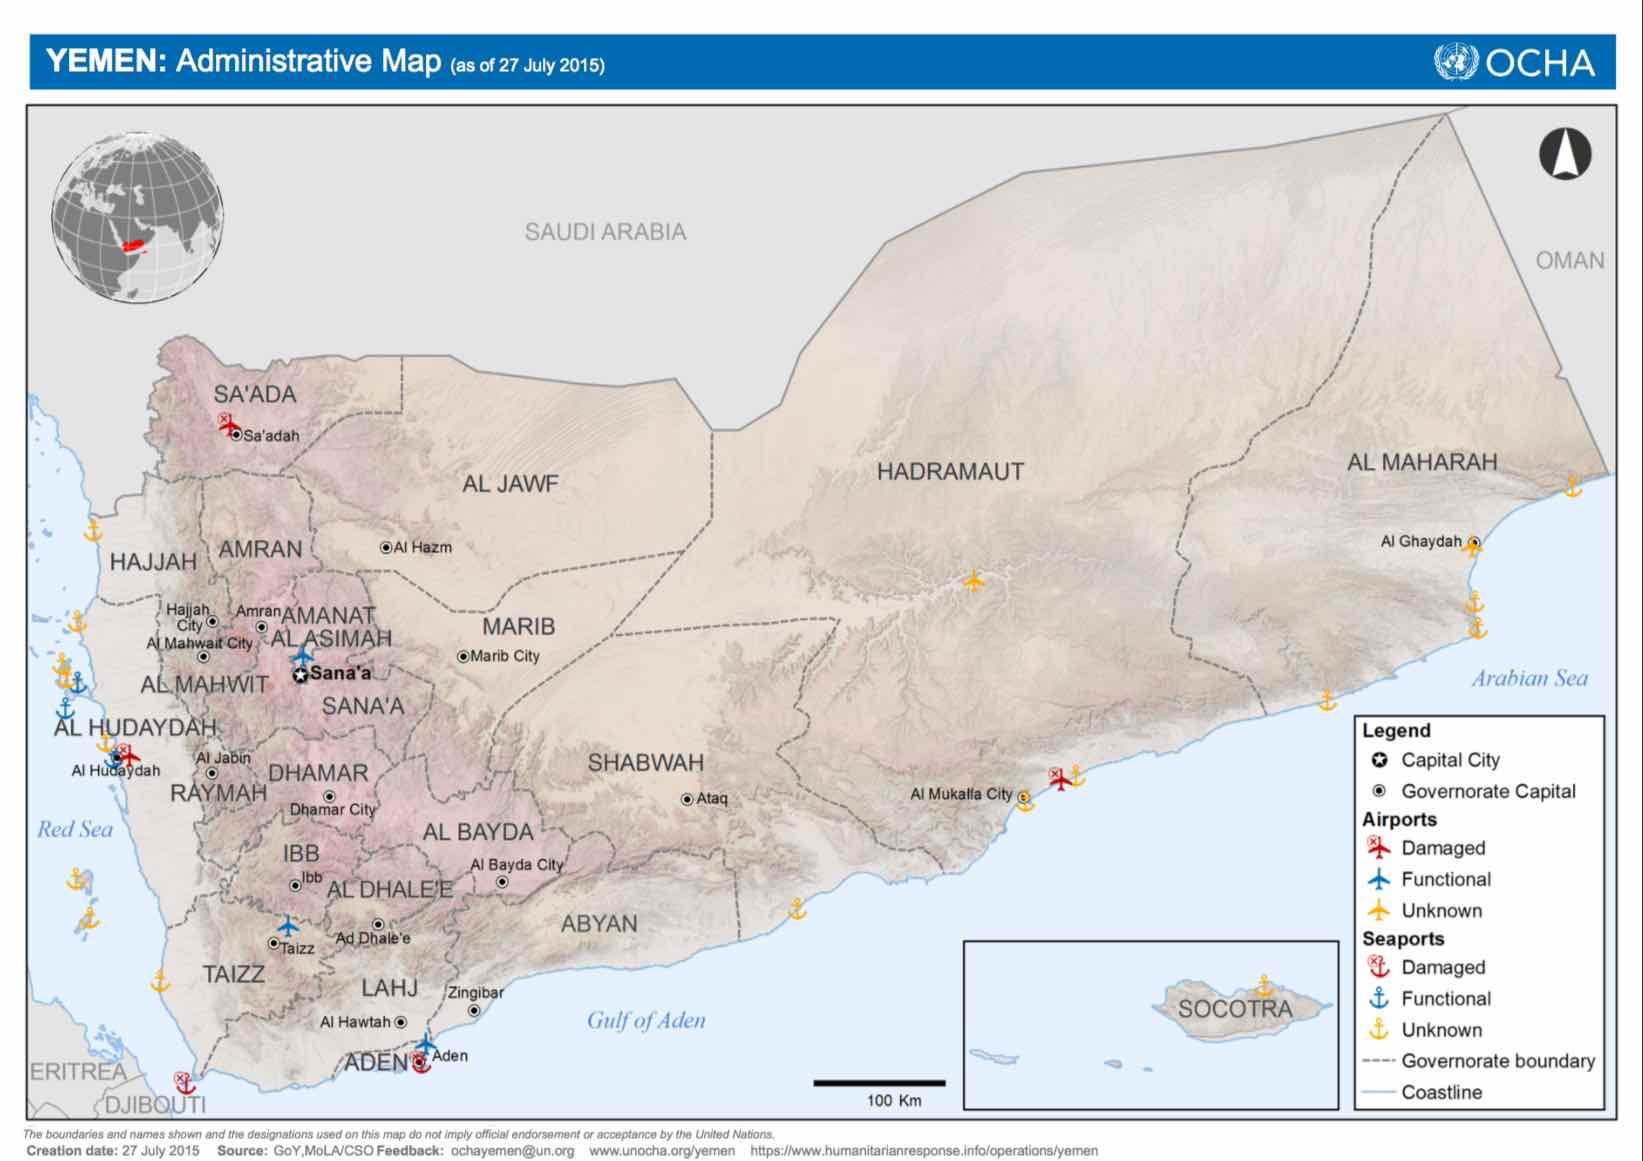 Yemen Administrative Seaports Airports